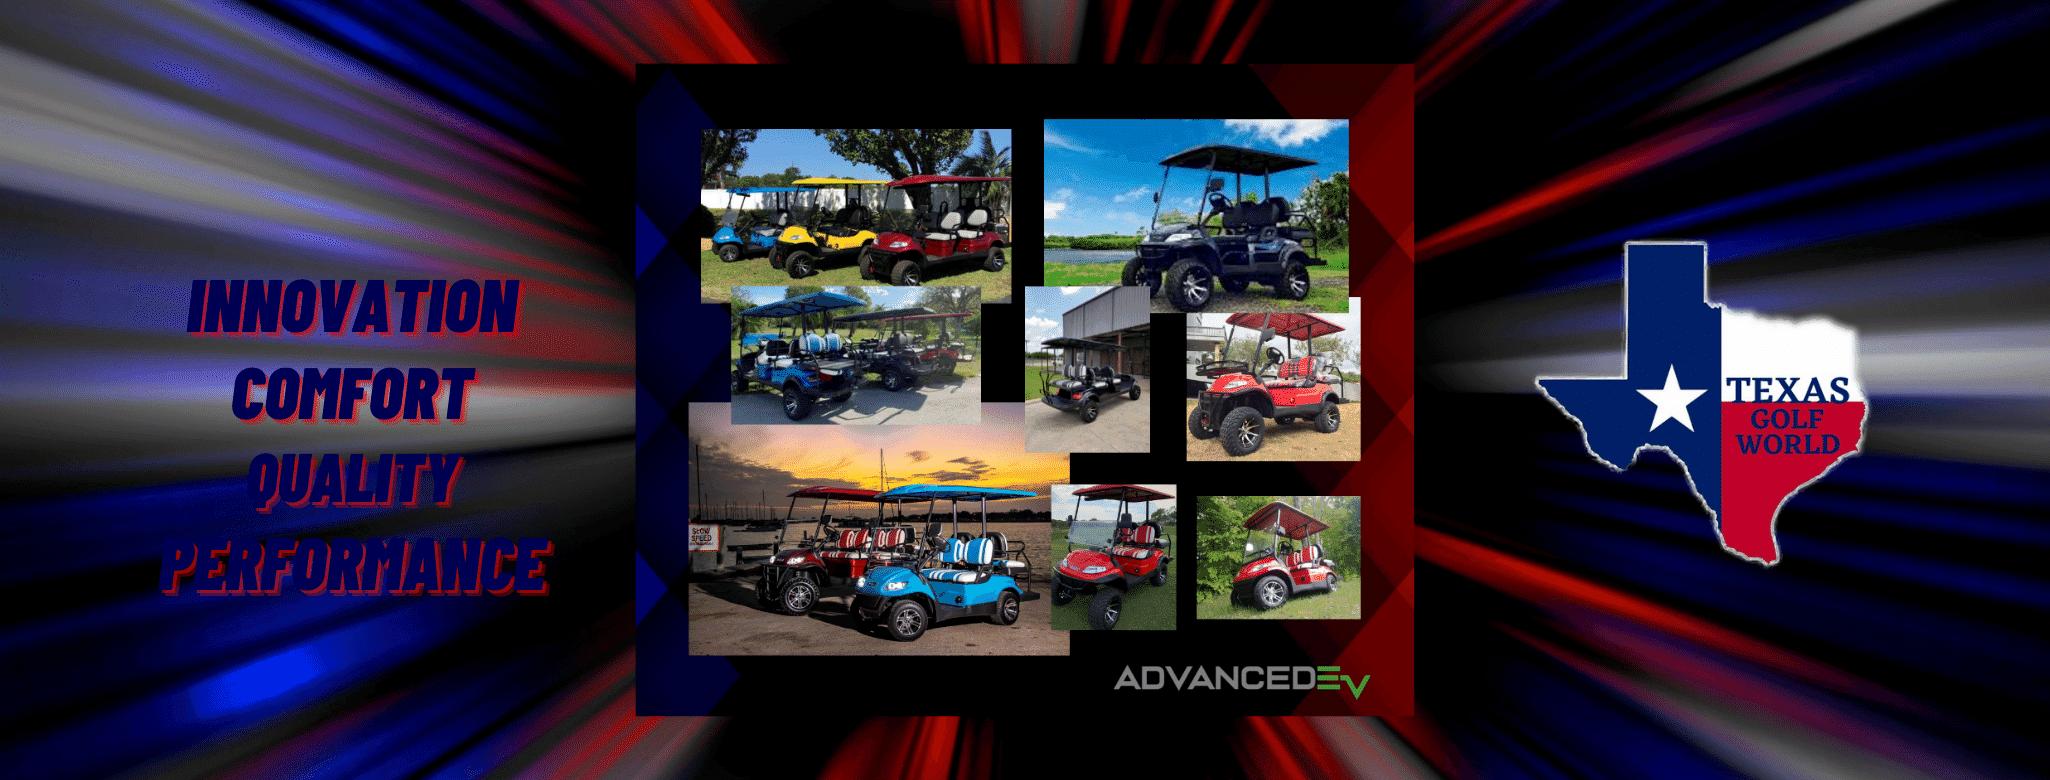 Advanced EV Golf Carts